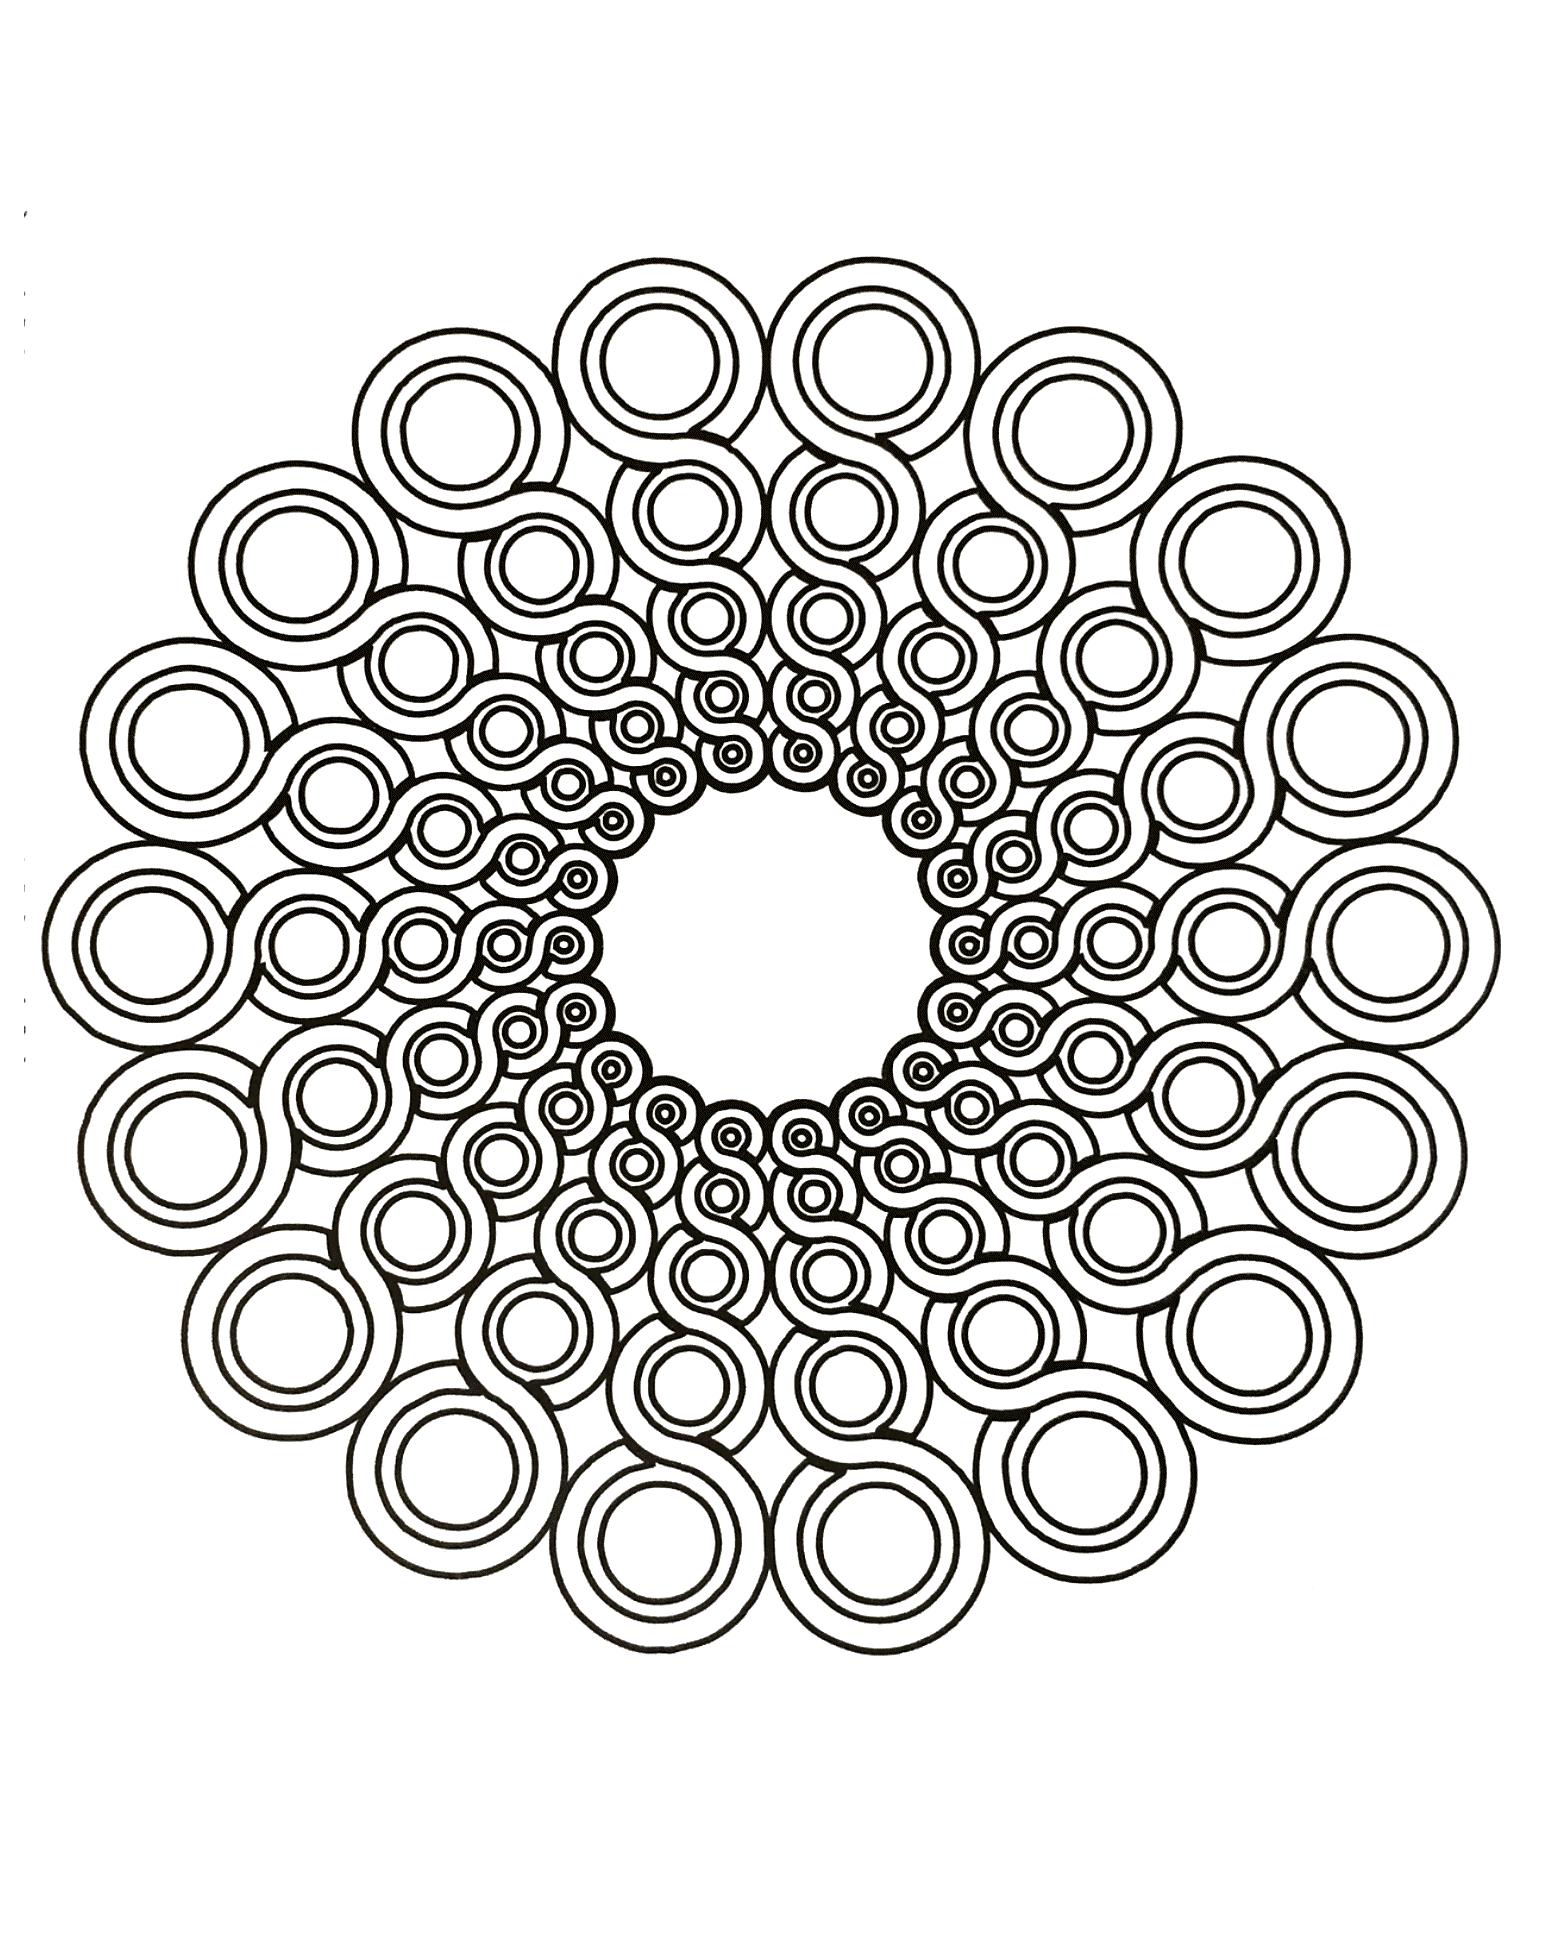 Colorear para adultos : Mandalas - 68